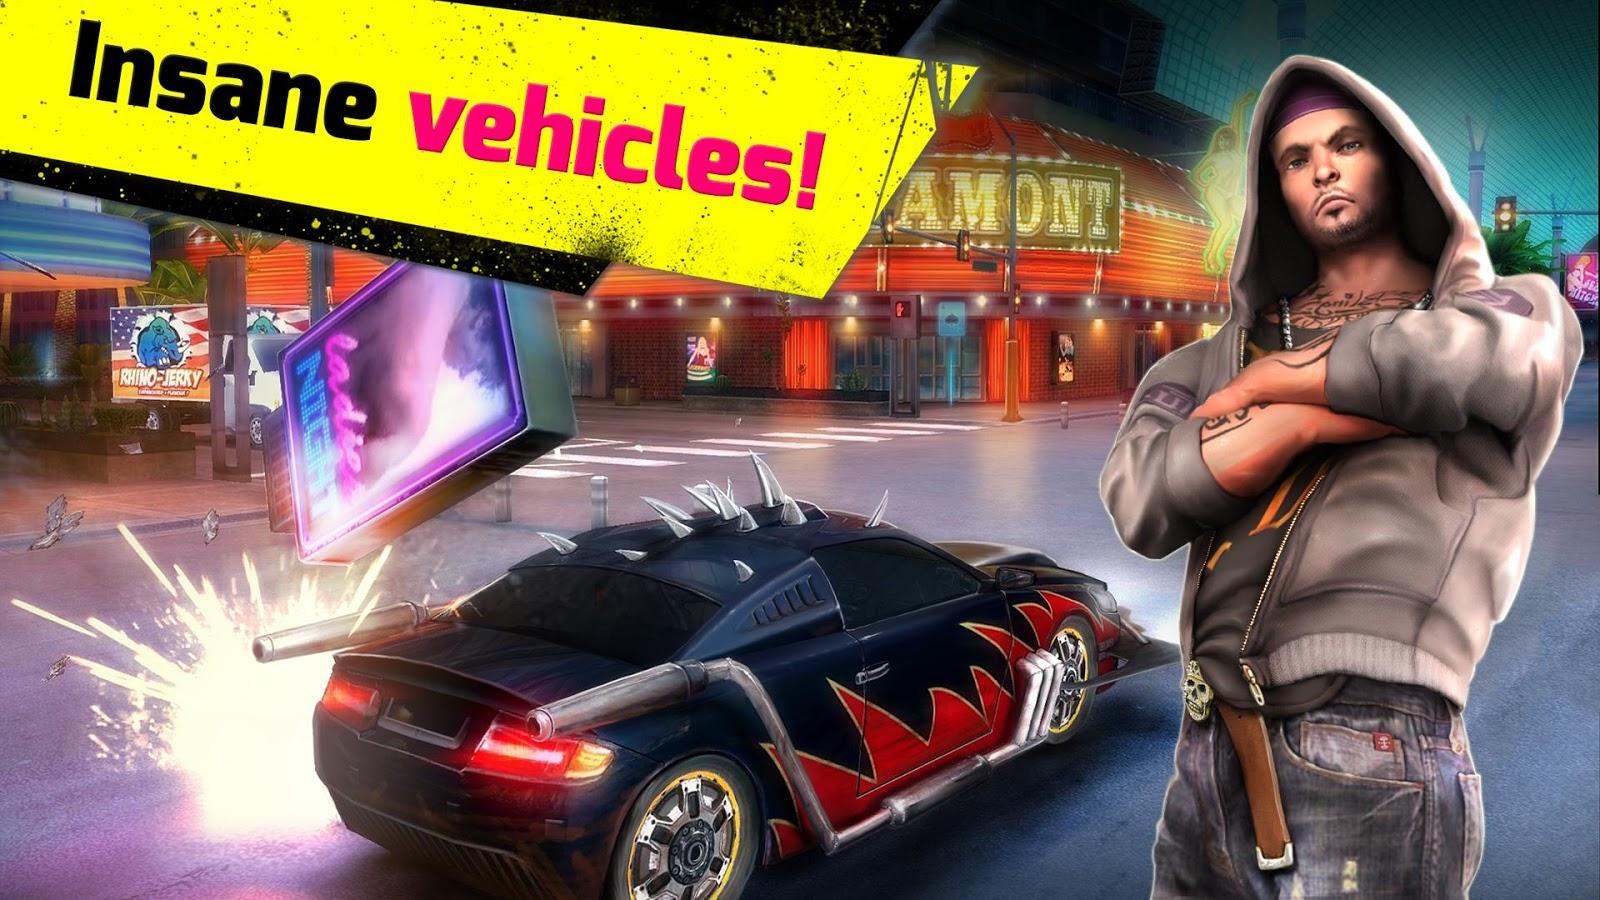 Gangstar vegas – games for android 2018 – free download. Gangstar.